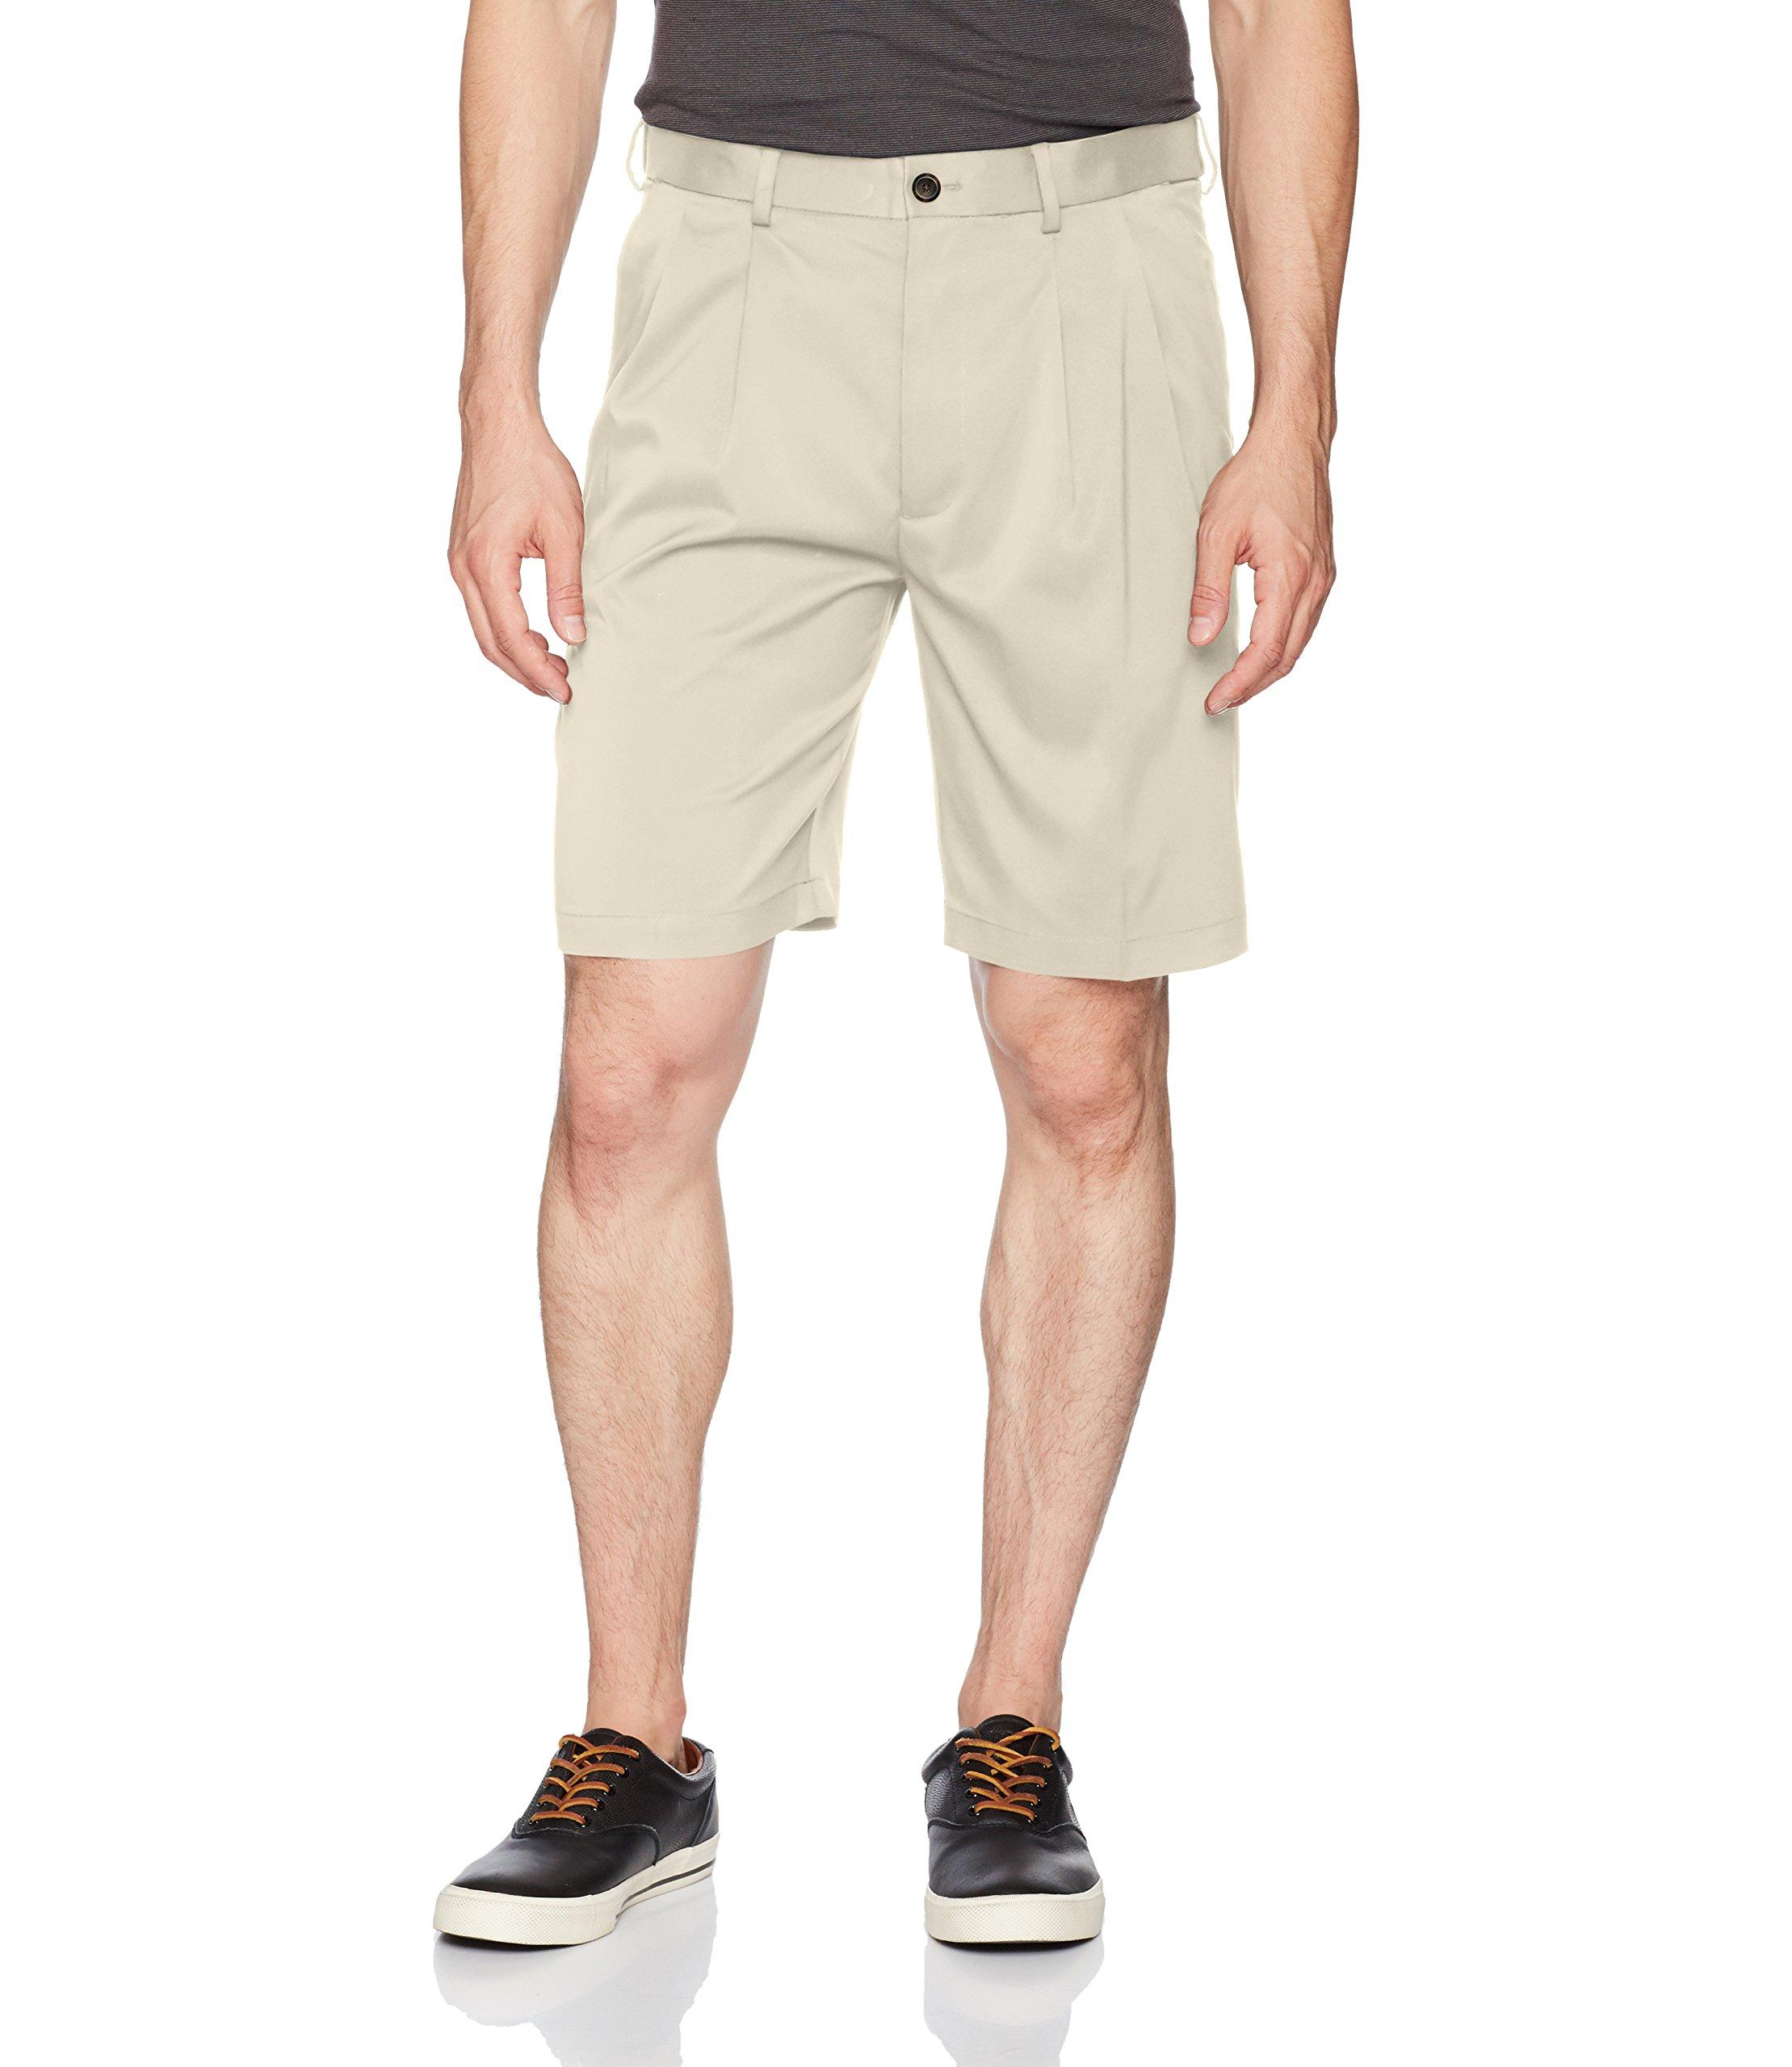 Savane Men's Pleated Mirco Fiber Short, Overcast, 38 by Savane